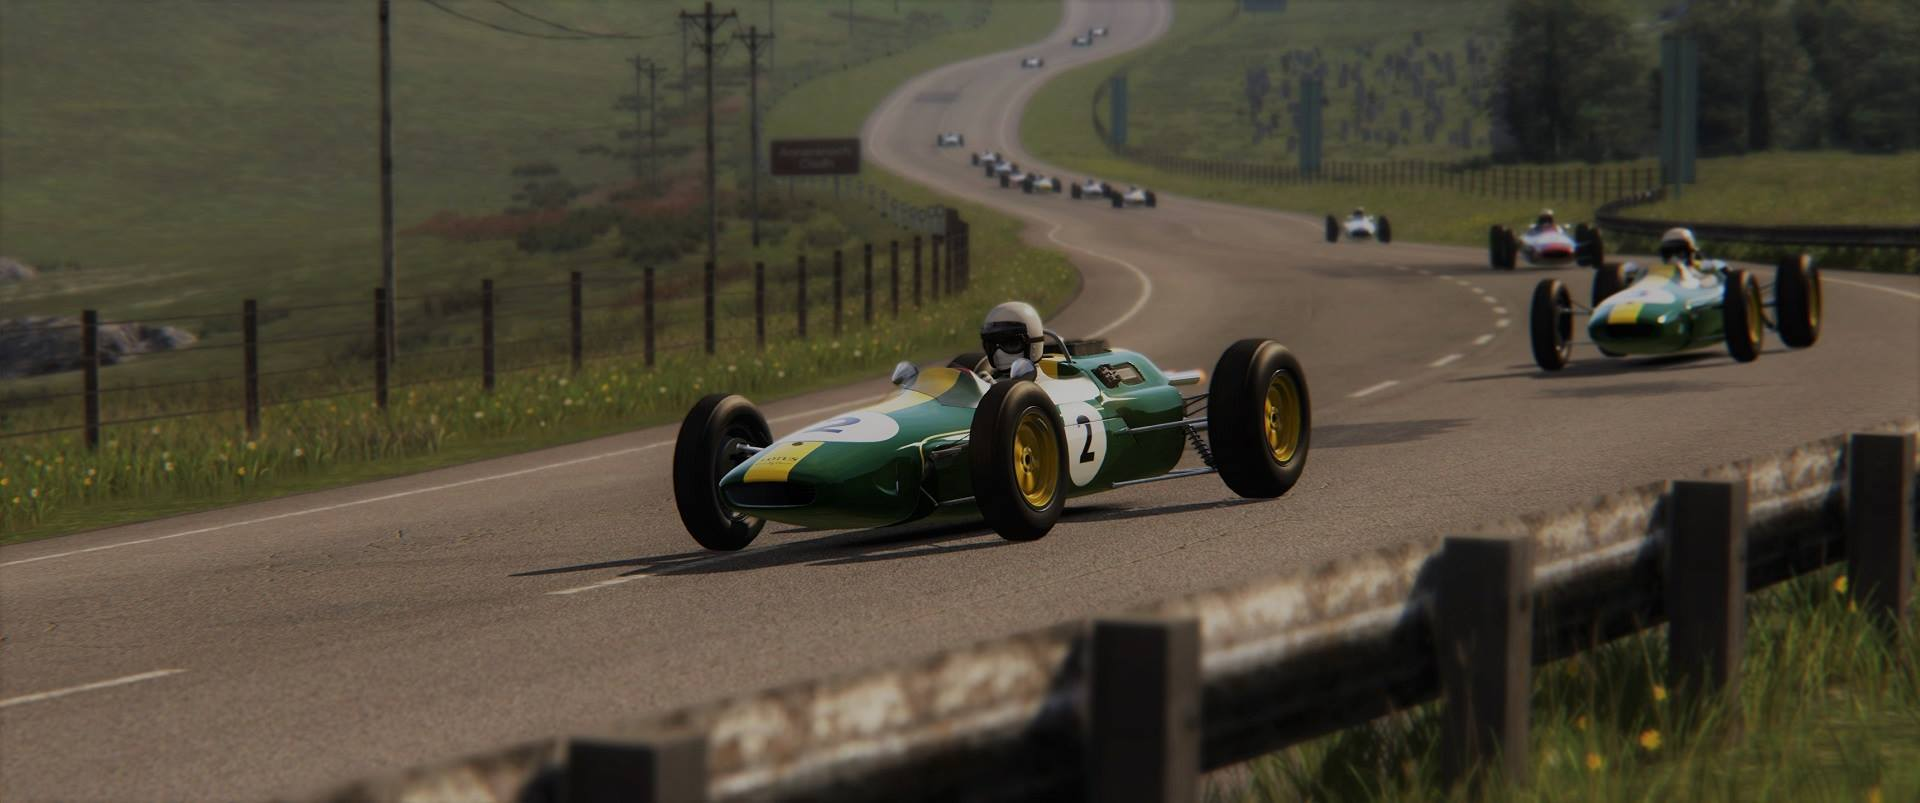 assetto corsa tracks